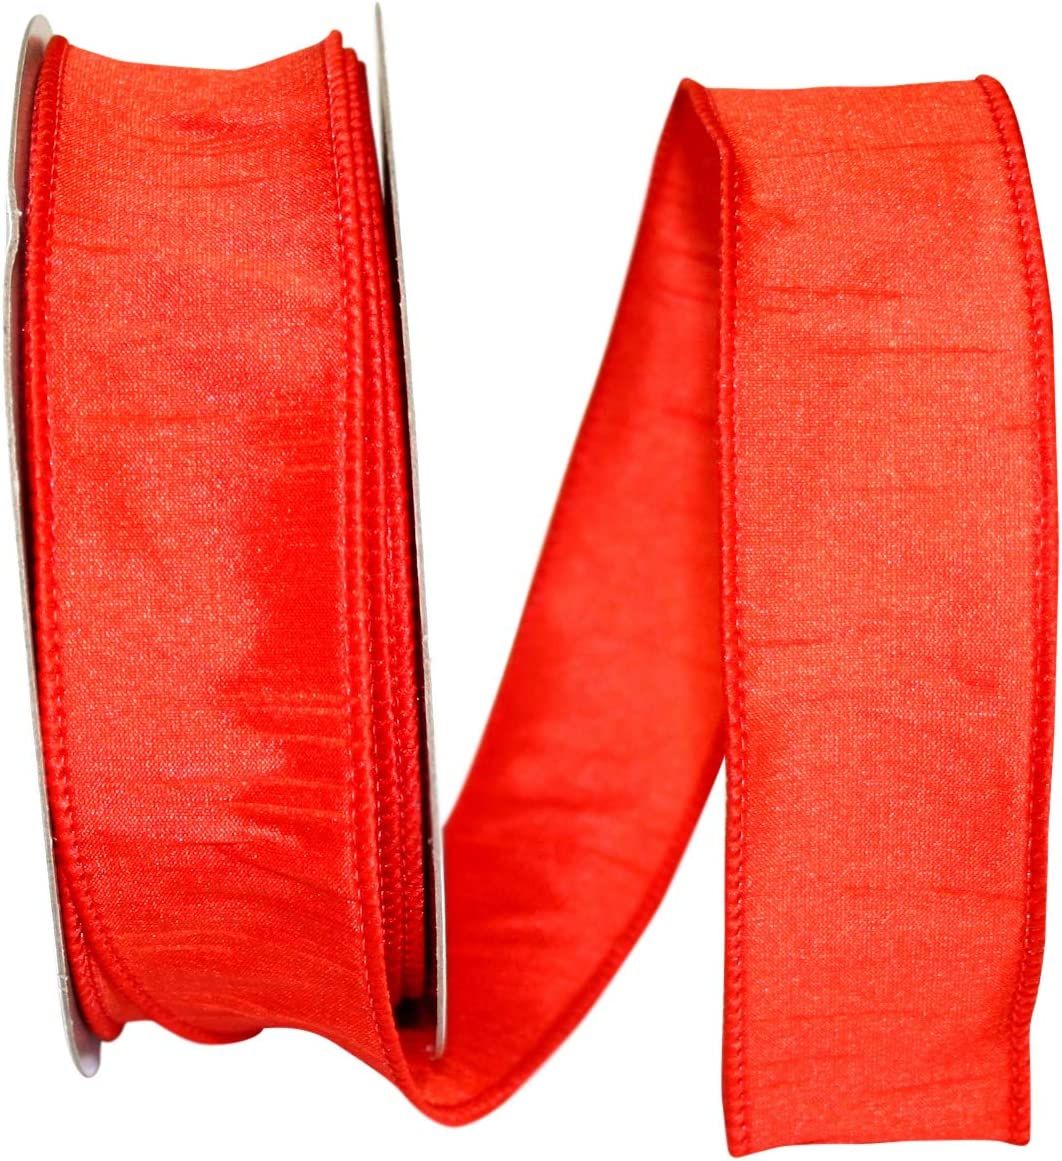 1-1//2 Inch X 10 Yards Pink Reliant Ribbon 92975W-061-09F Dupioni Supreme Wired Edge Ribbon